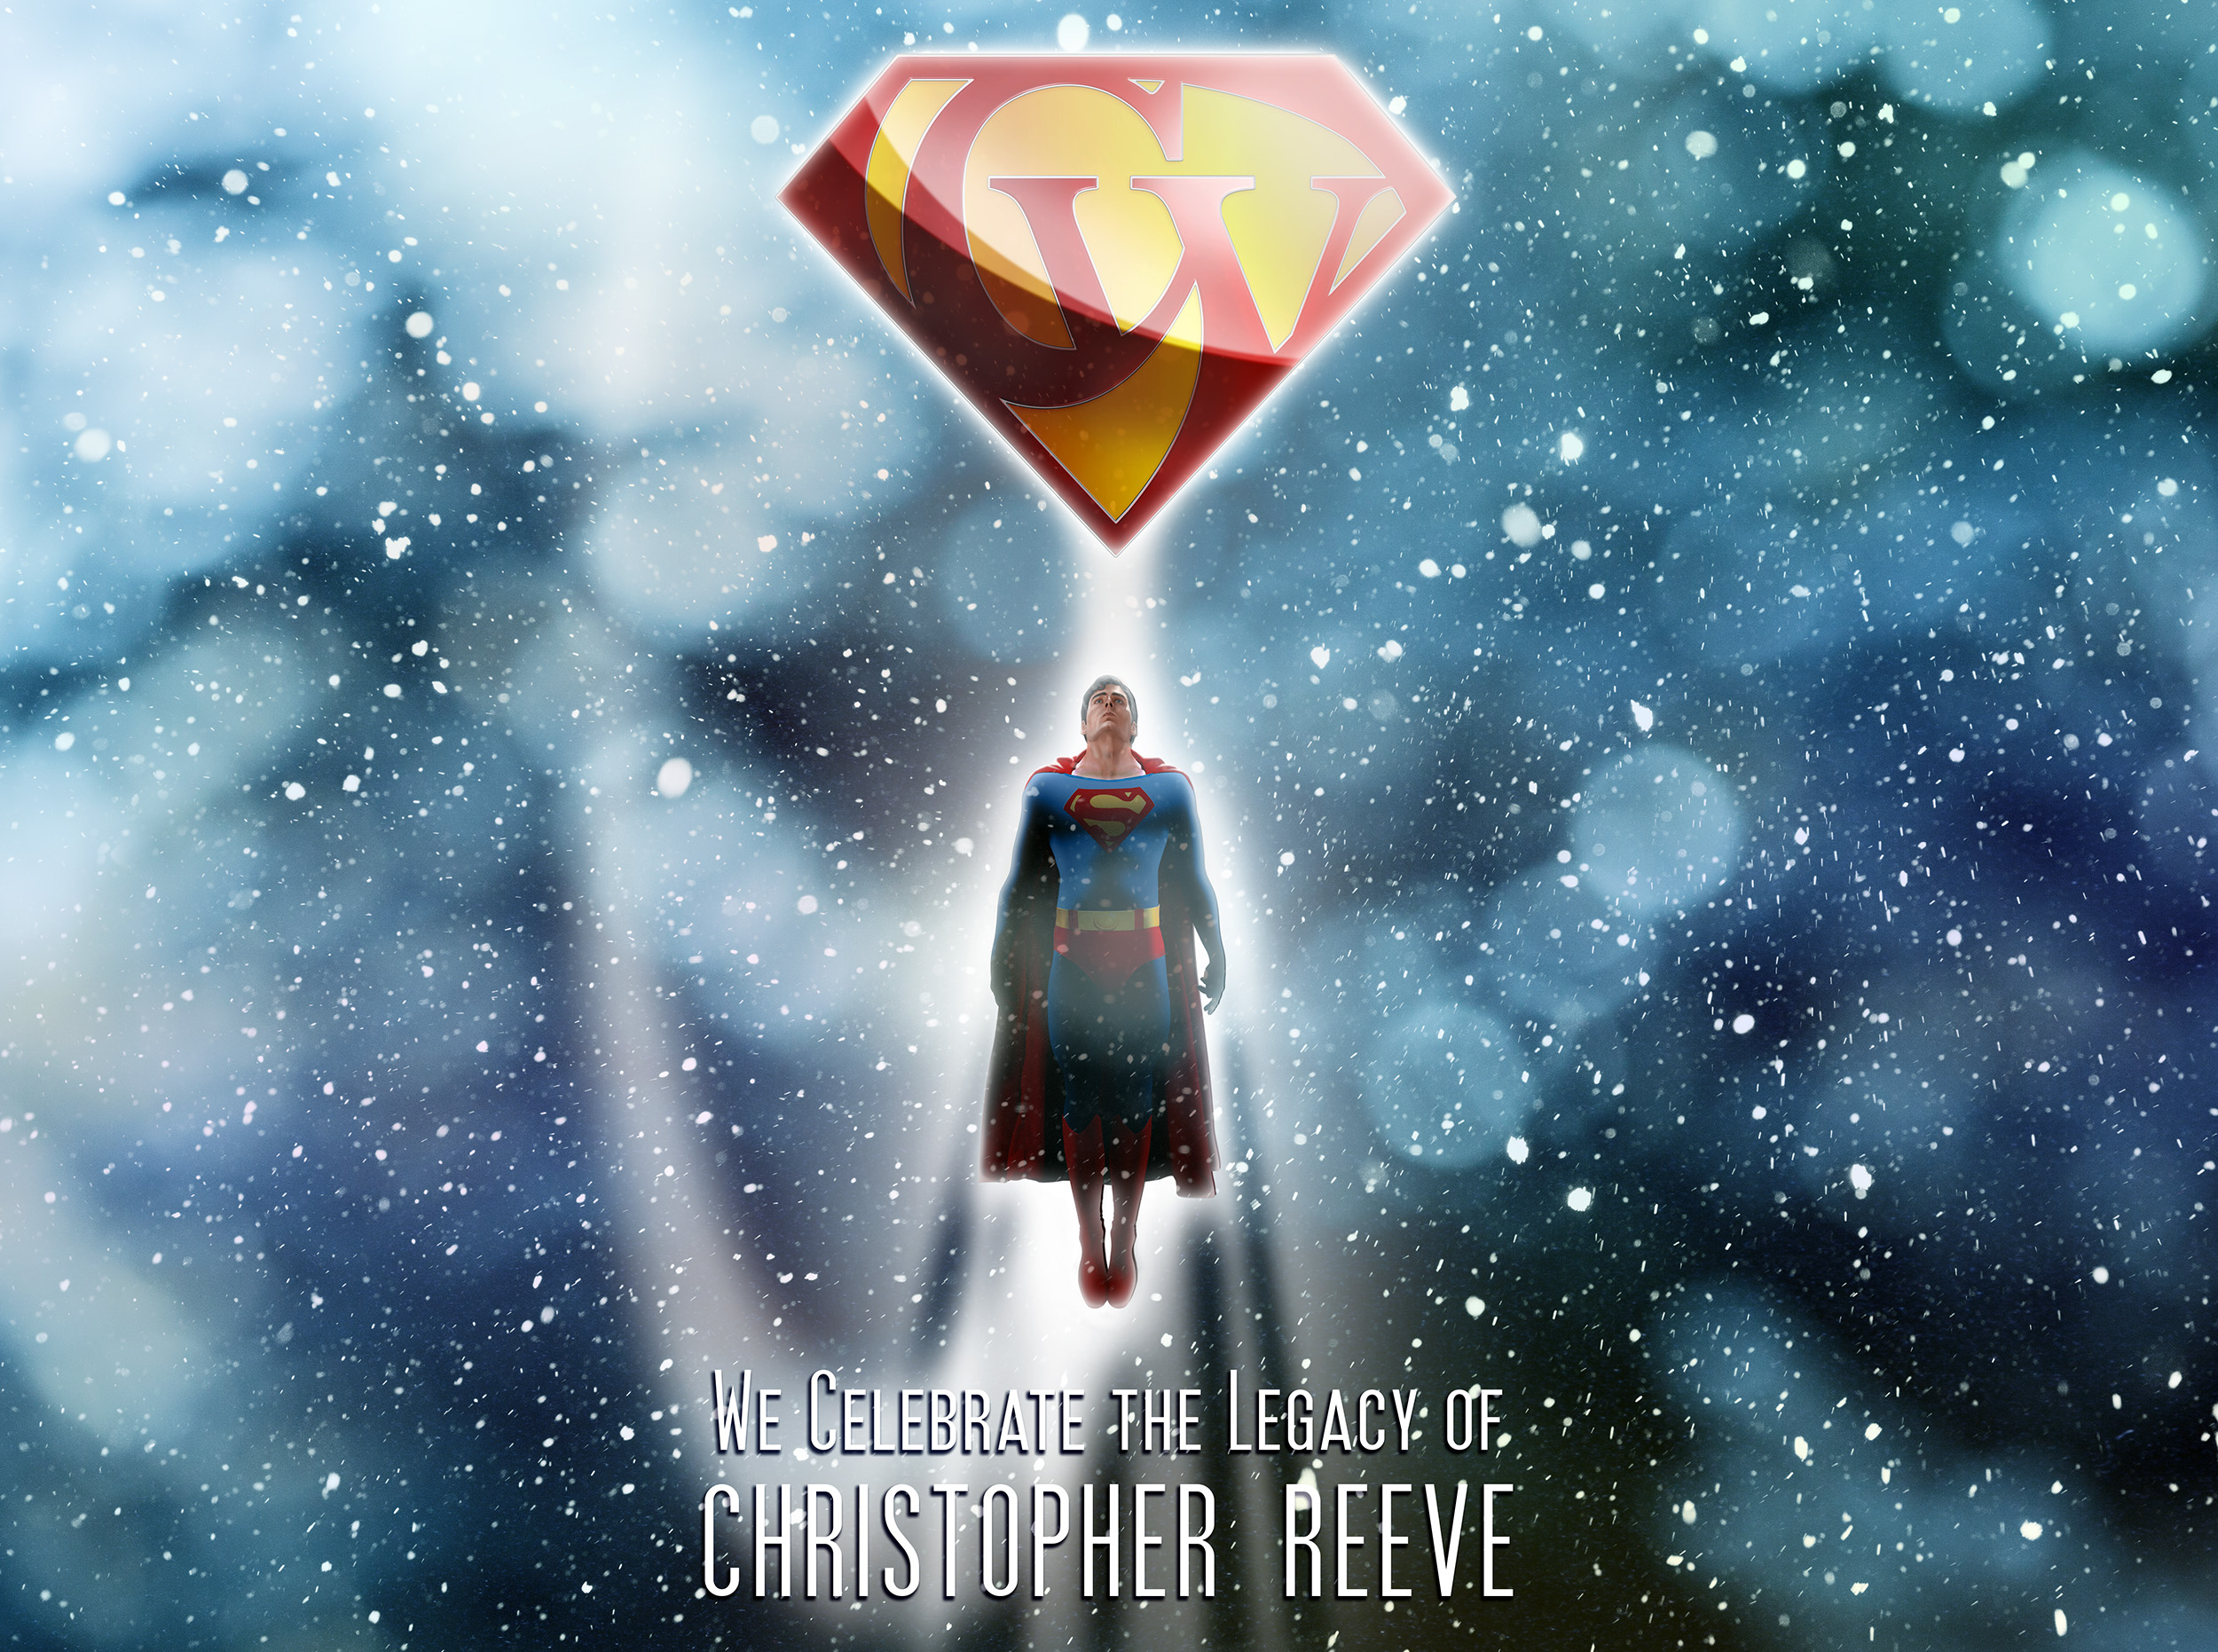 CapedWonder Superman Imagery. Christopher Reeve Superman Photos ...